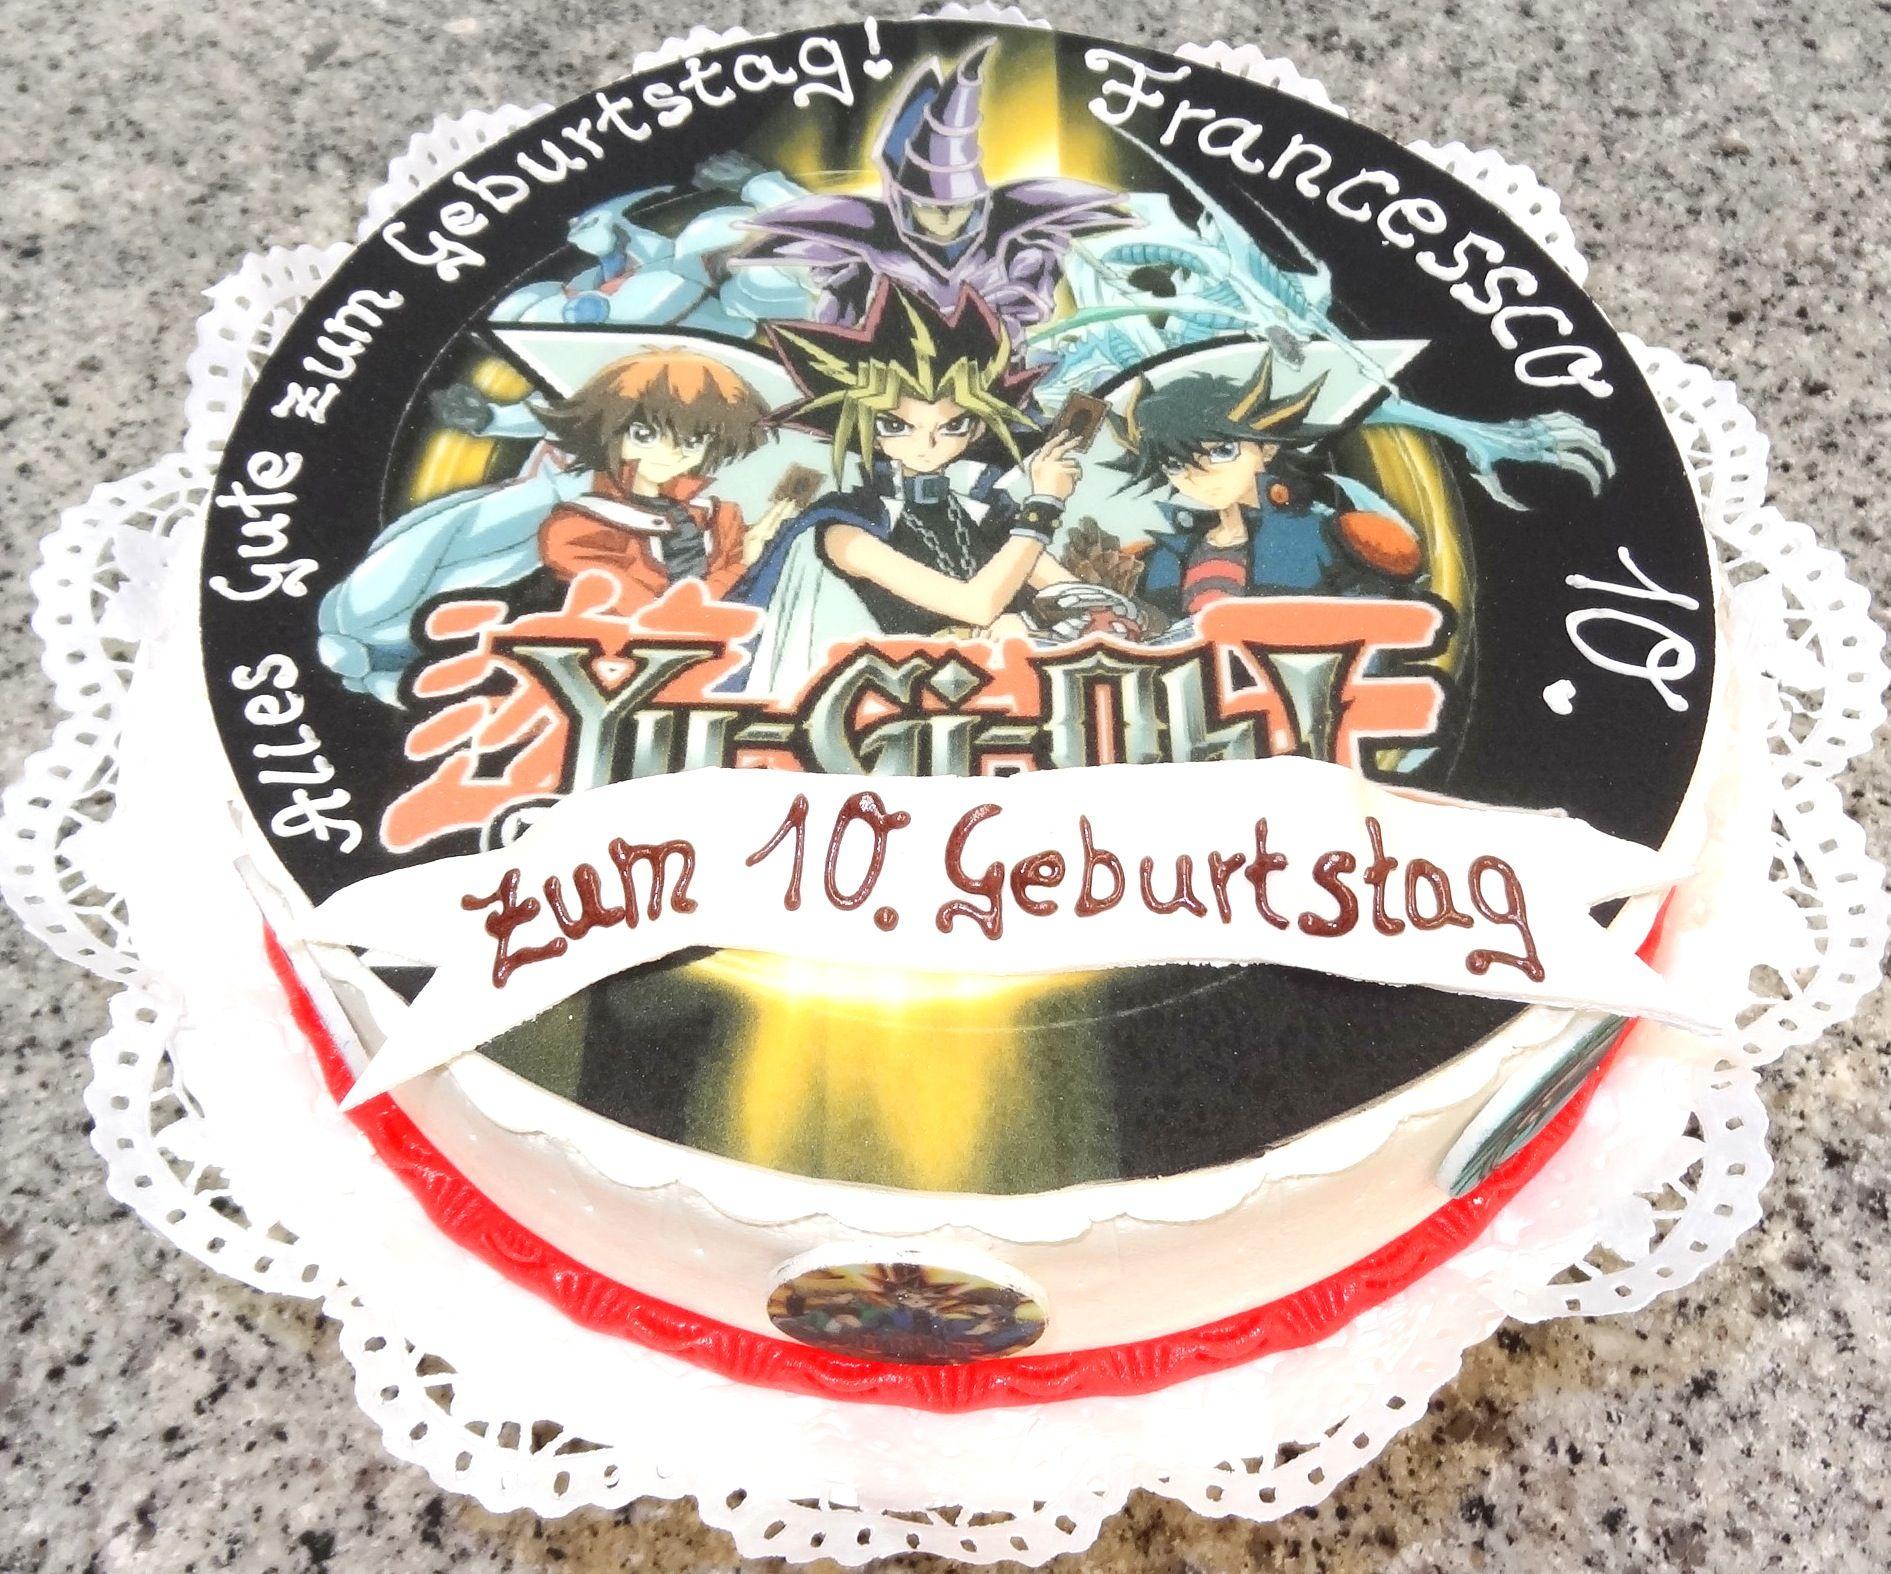 Geburtstagestorte Yu Gi Oh Handgemacht Von Cafe Riese Koln Yu Gi Oh Birthday Cake Handmade By Cafe Riese Cologne German Geburtstagstorte Geburt Yu Gi Oh